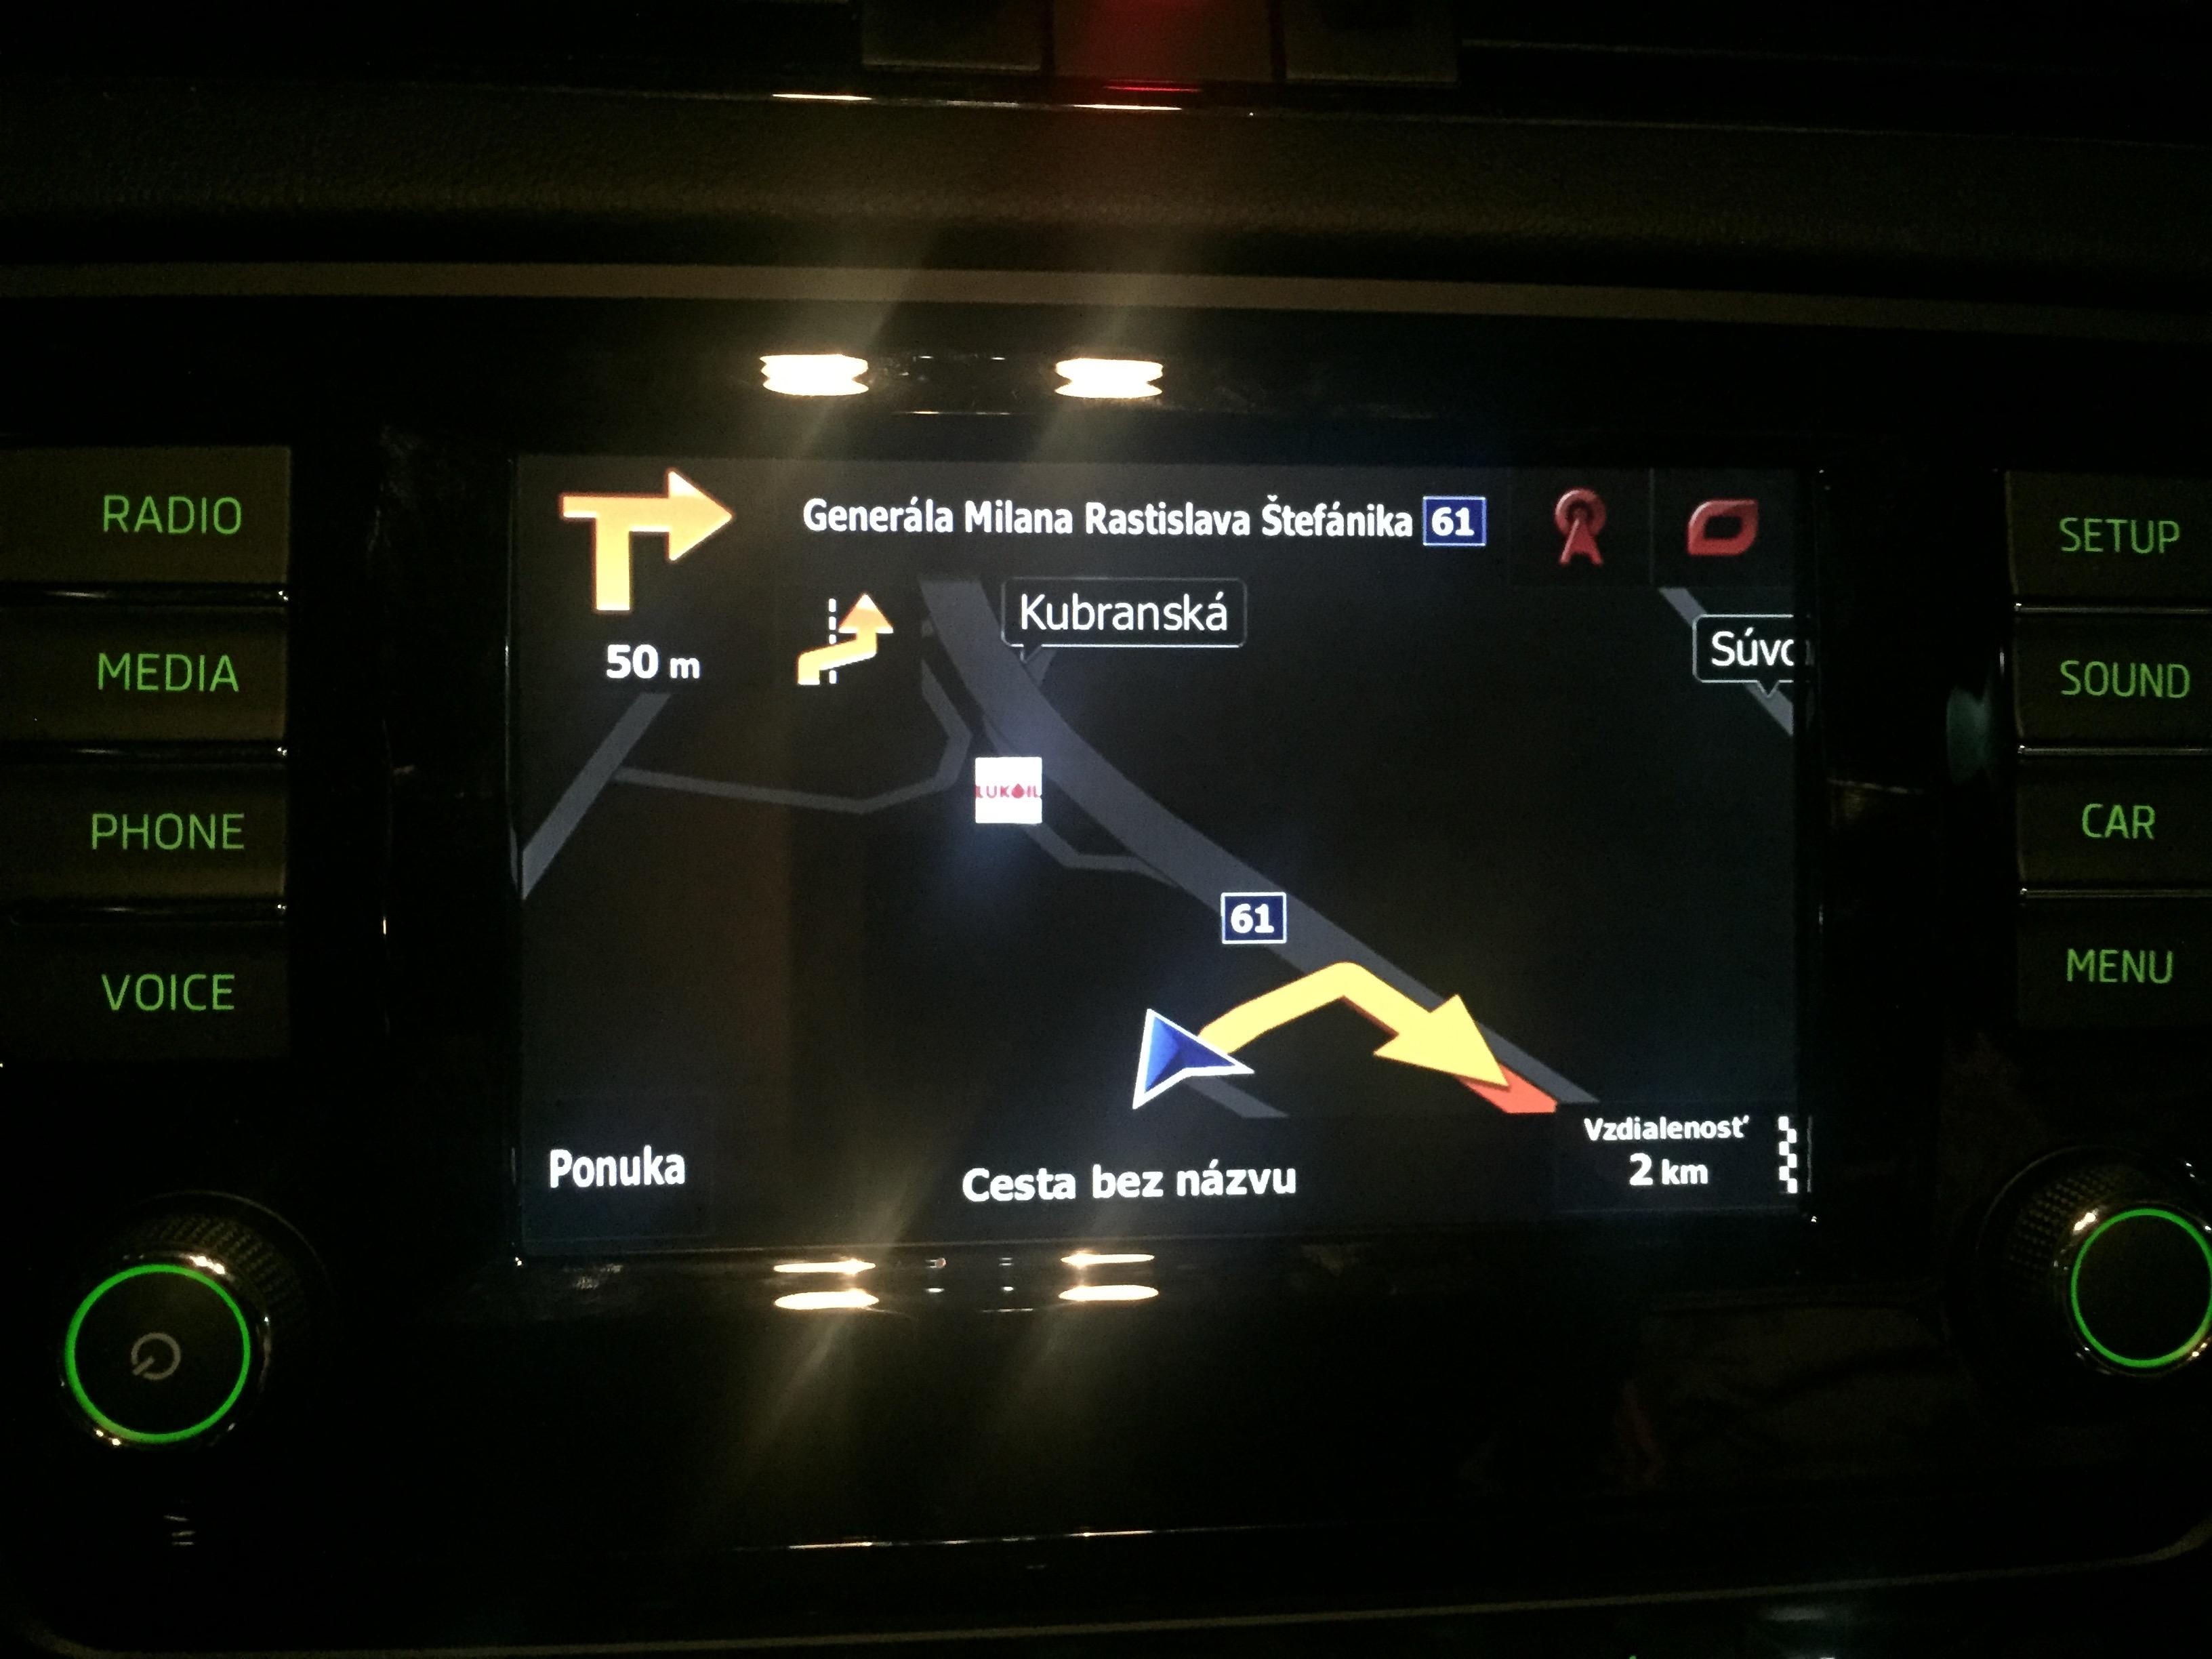 AXION navig�cia integrovan� do VW Golf VII. - �koda Octavia III.